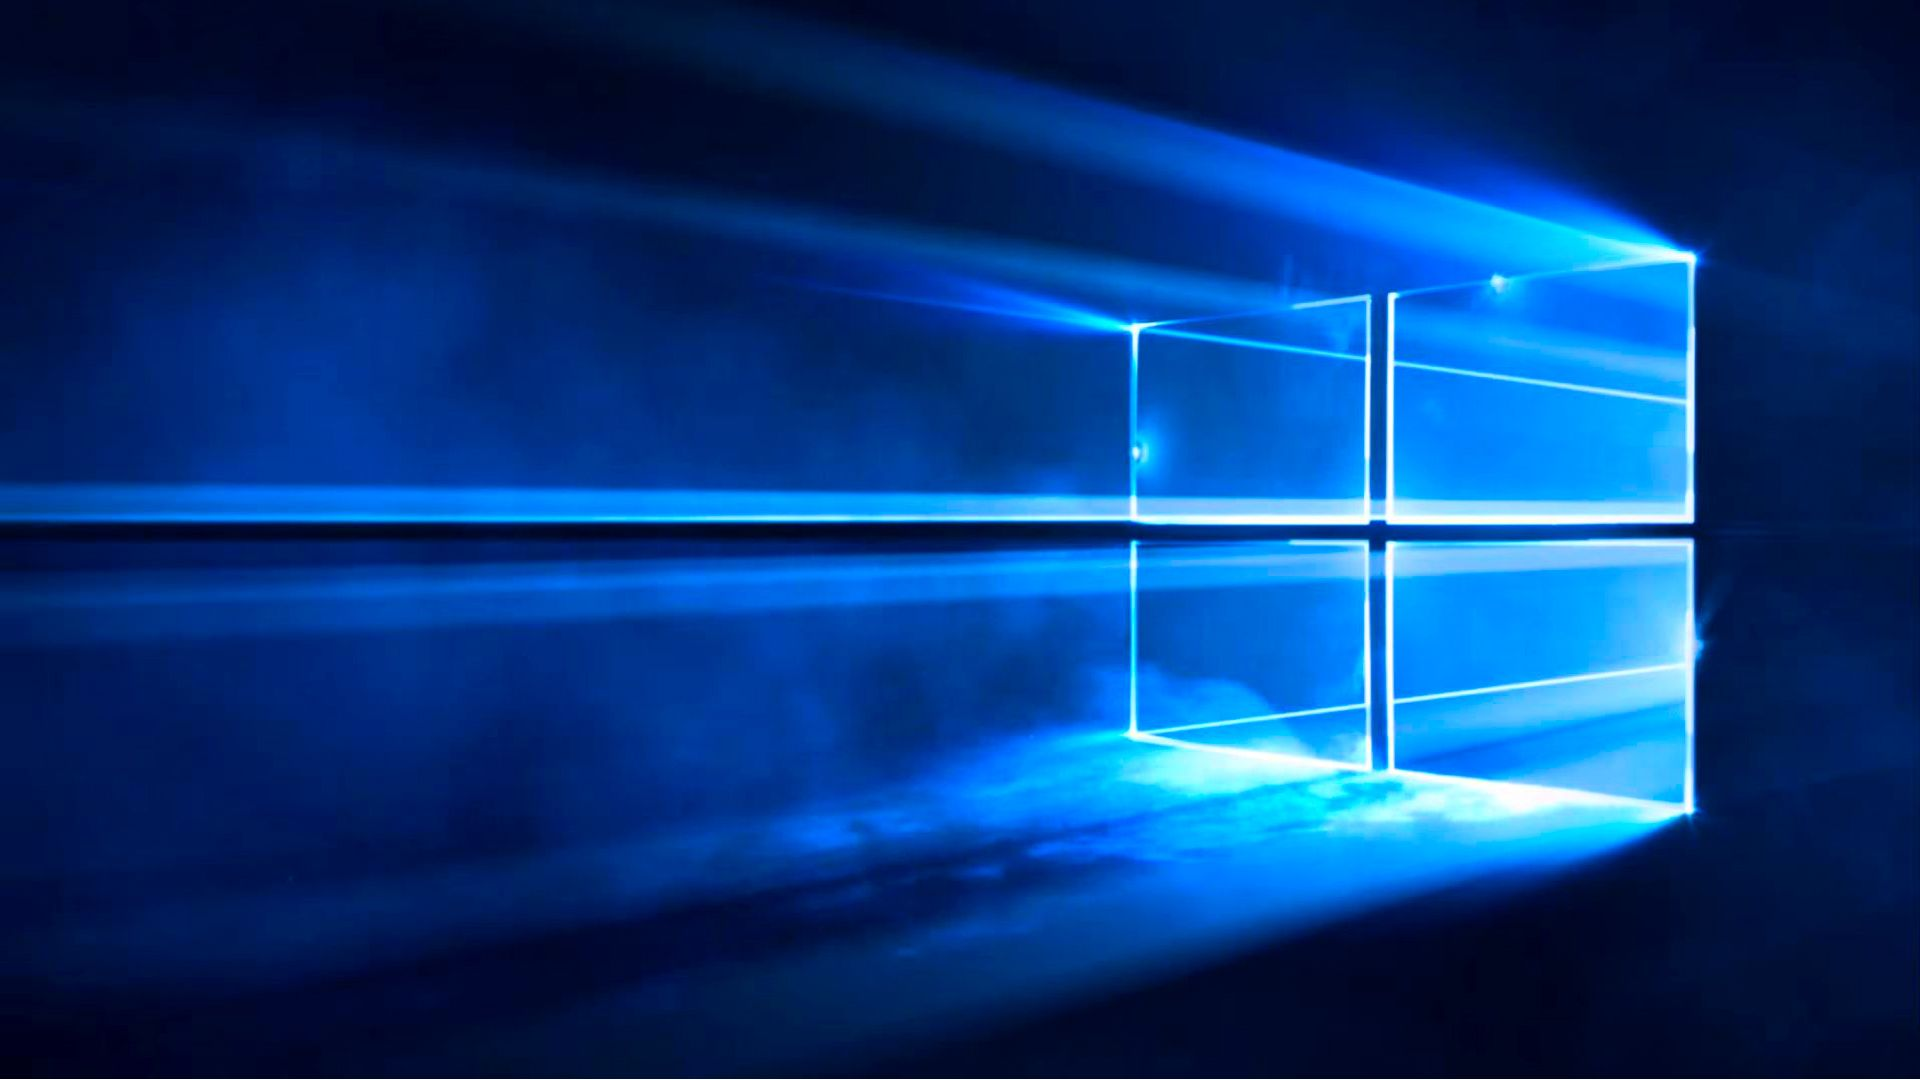 Download Wallpaper x Windows d Background Black Full